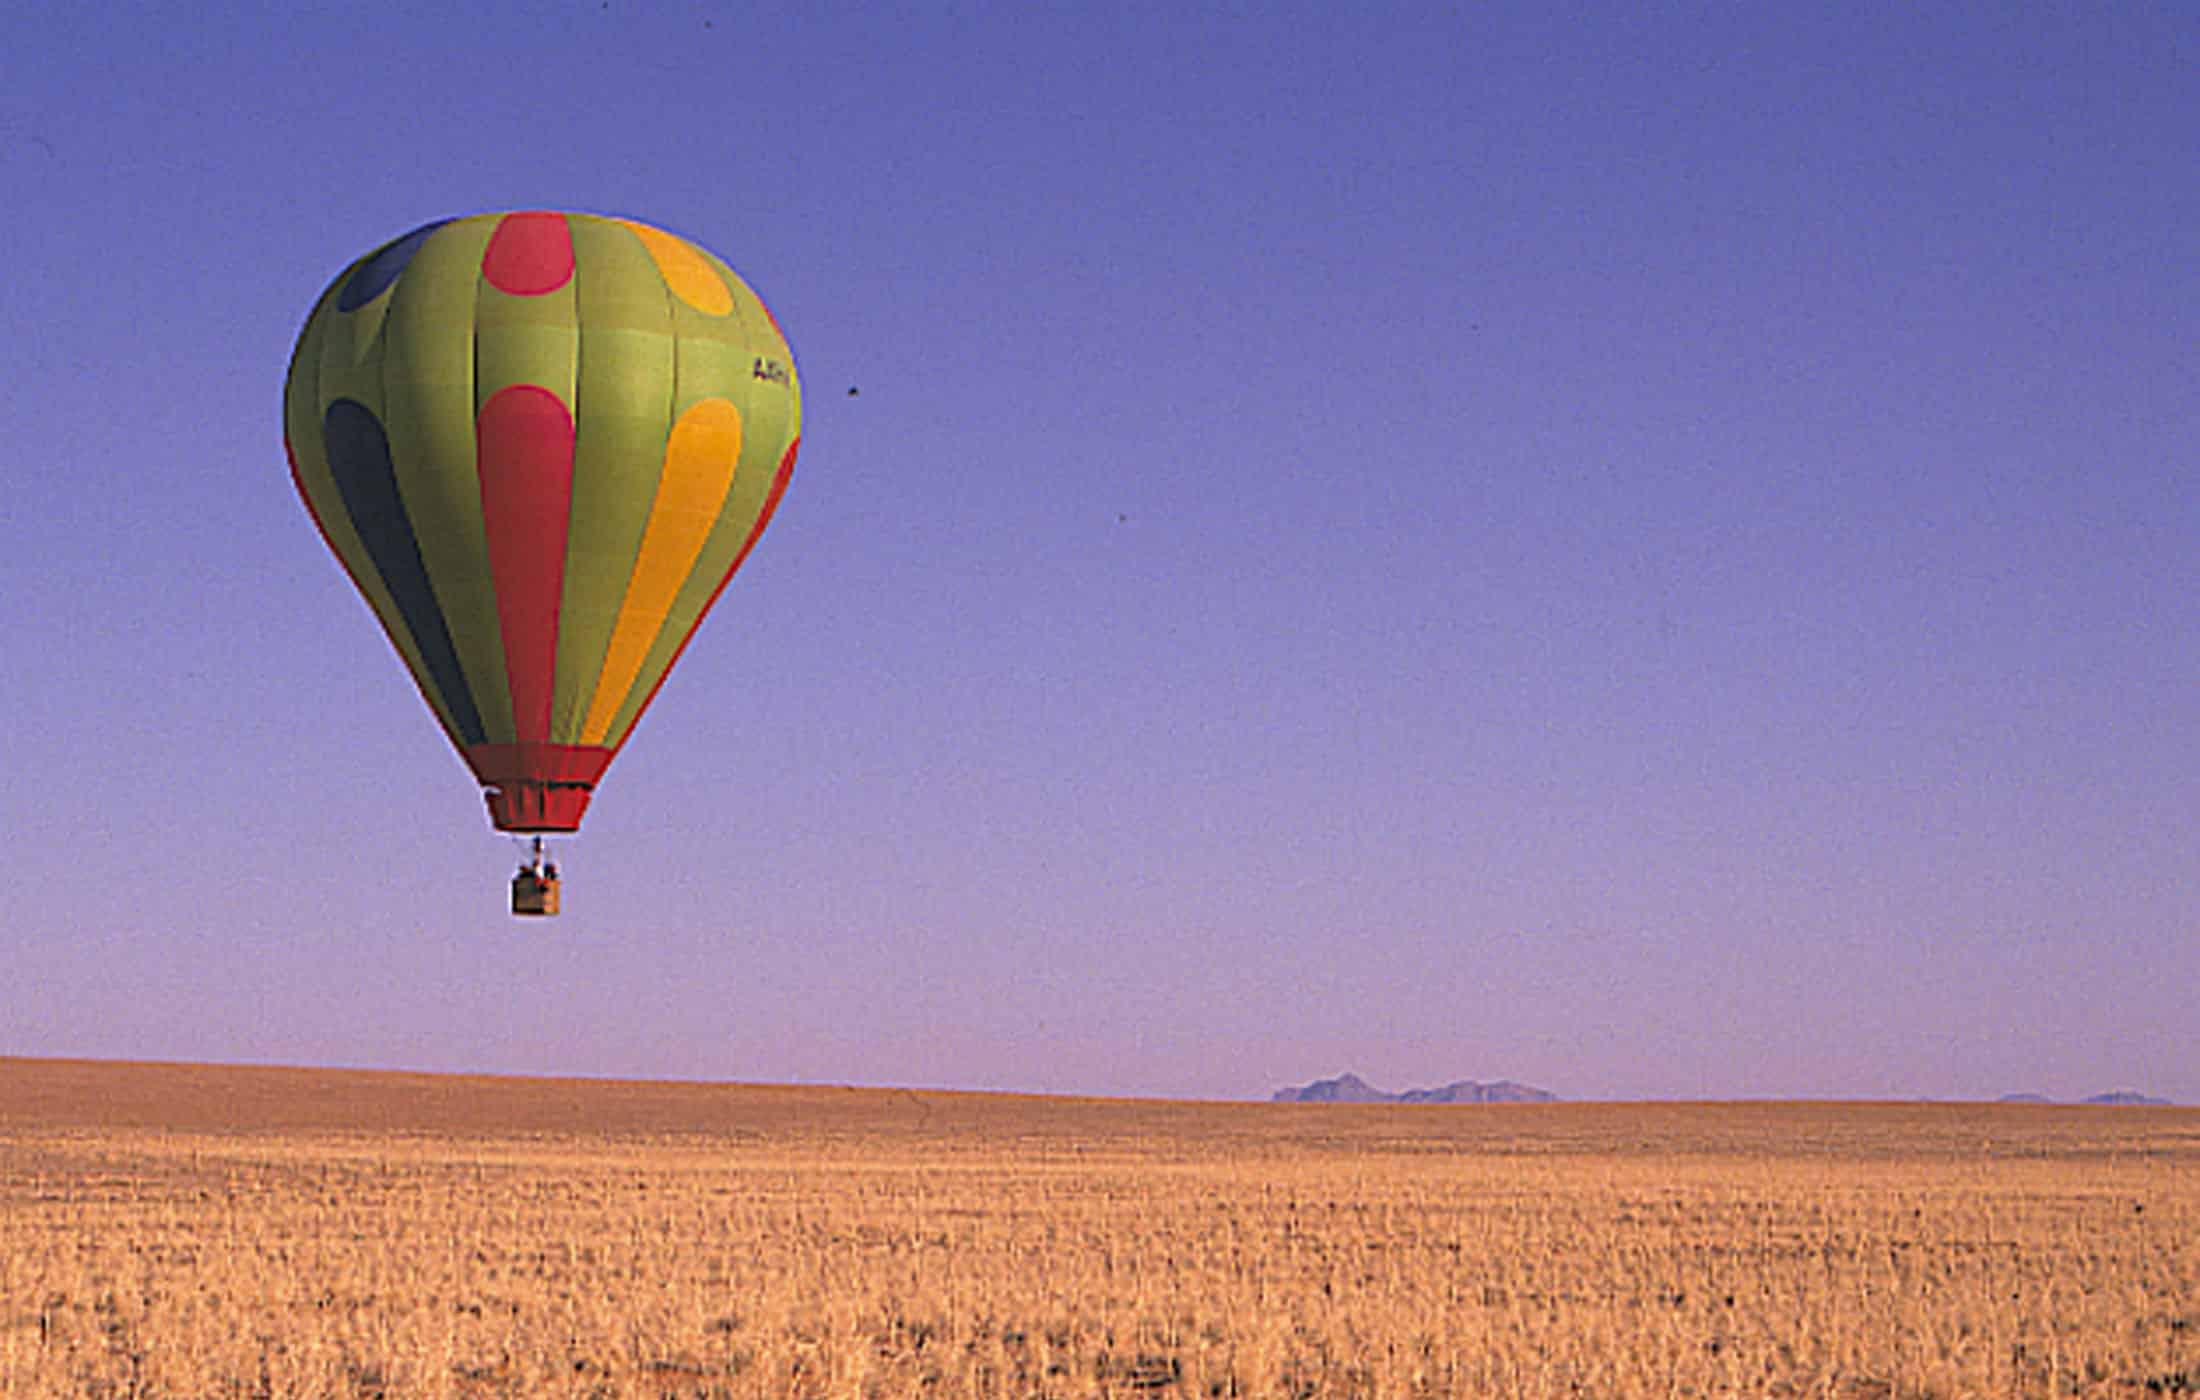 Ballooning over plains